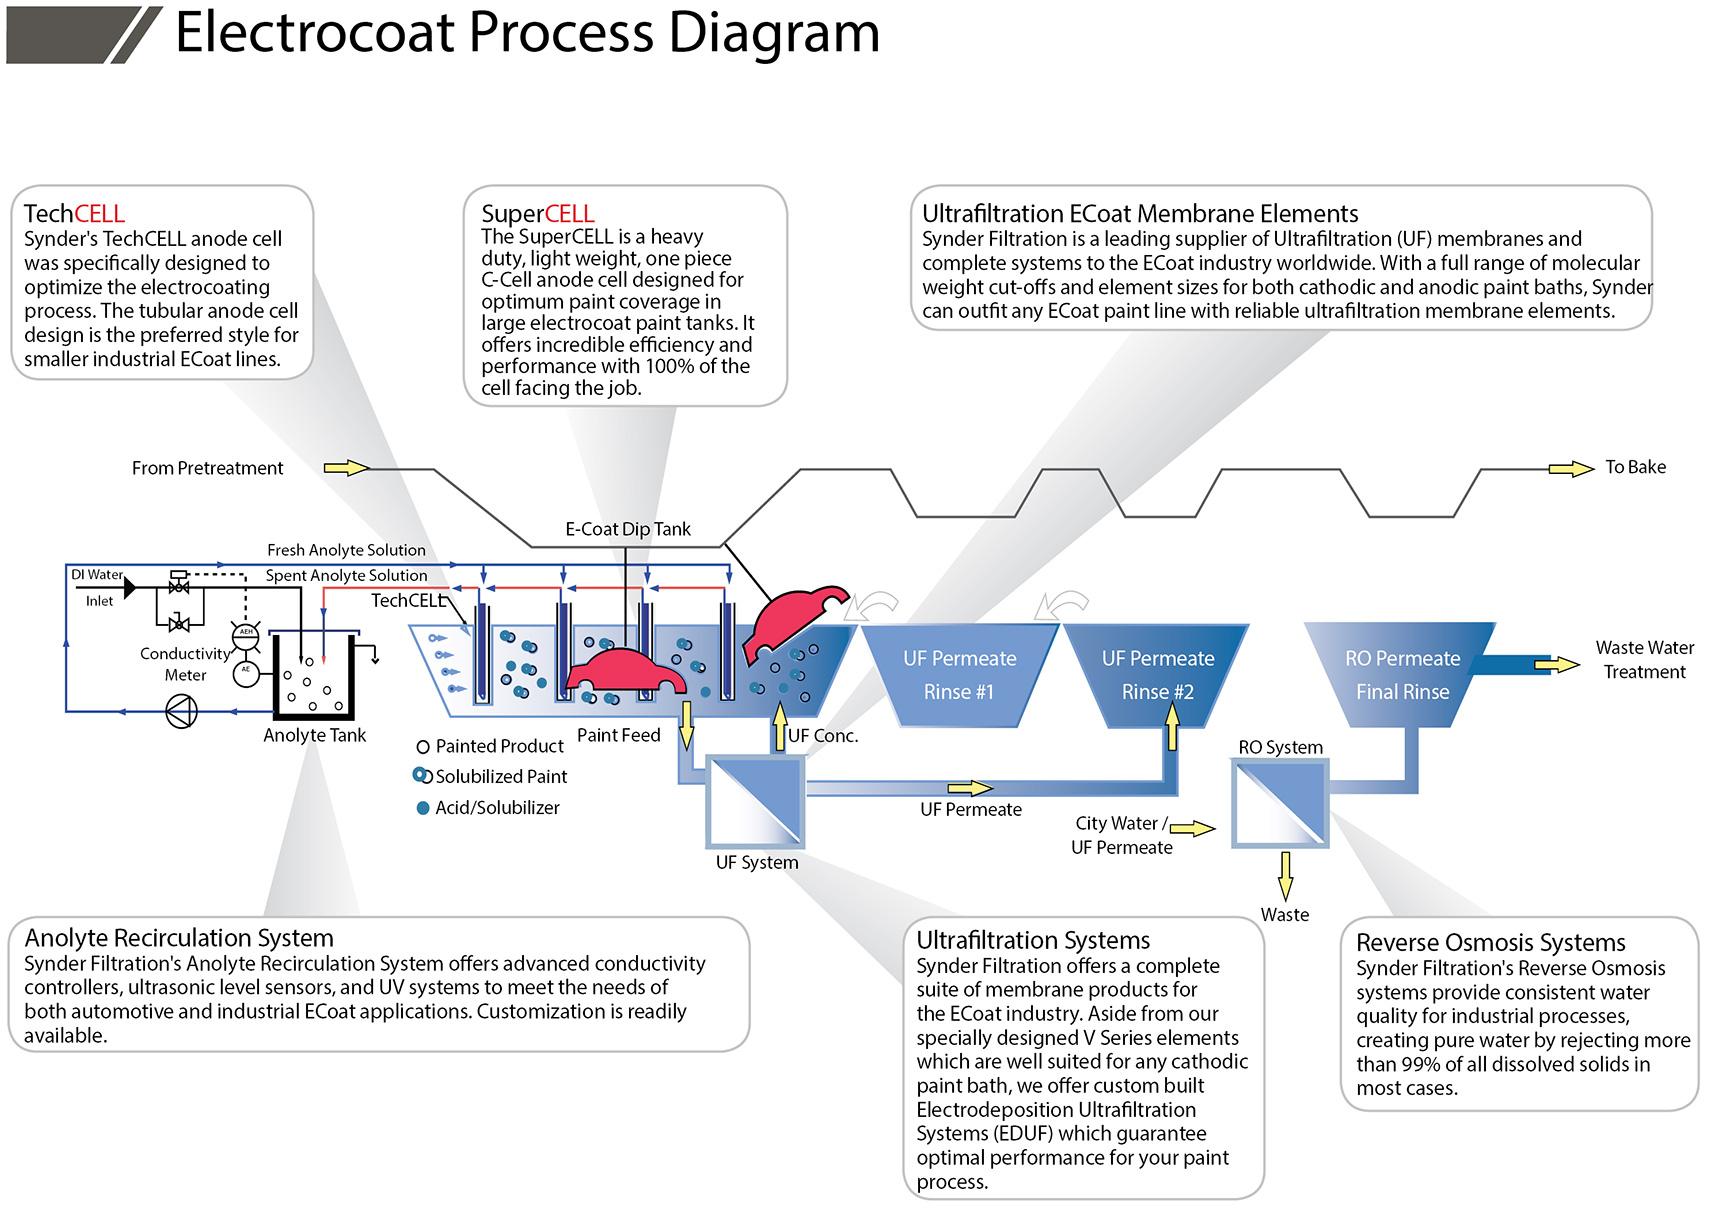 Electrocoat Industry